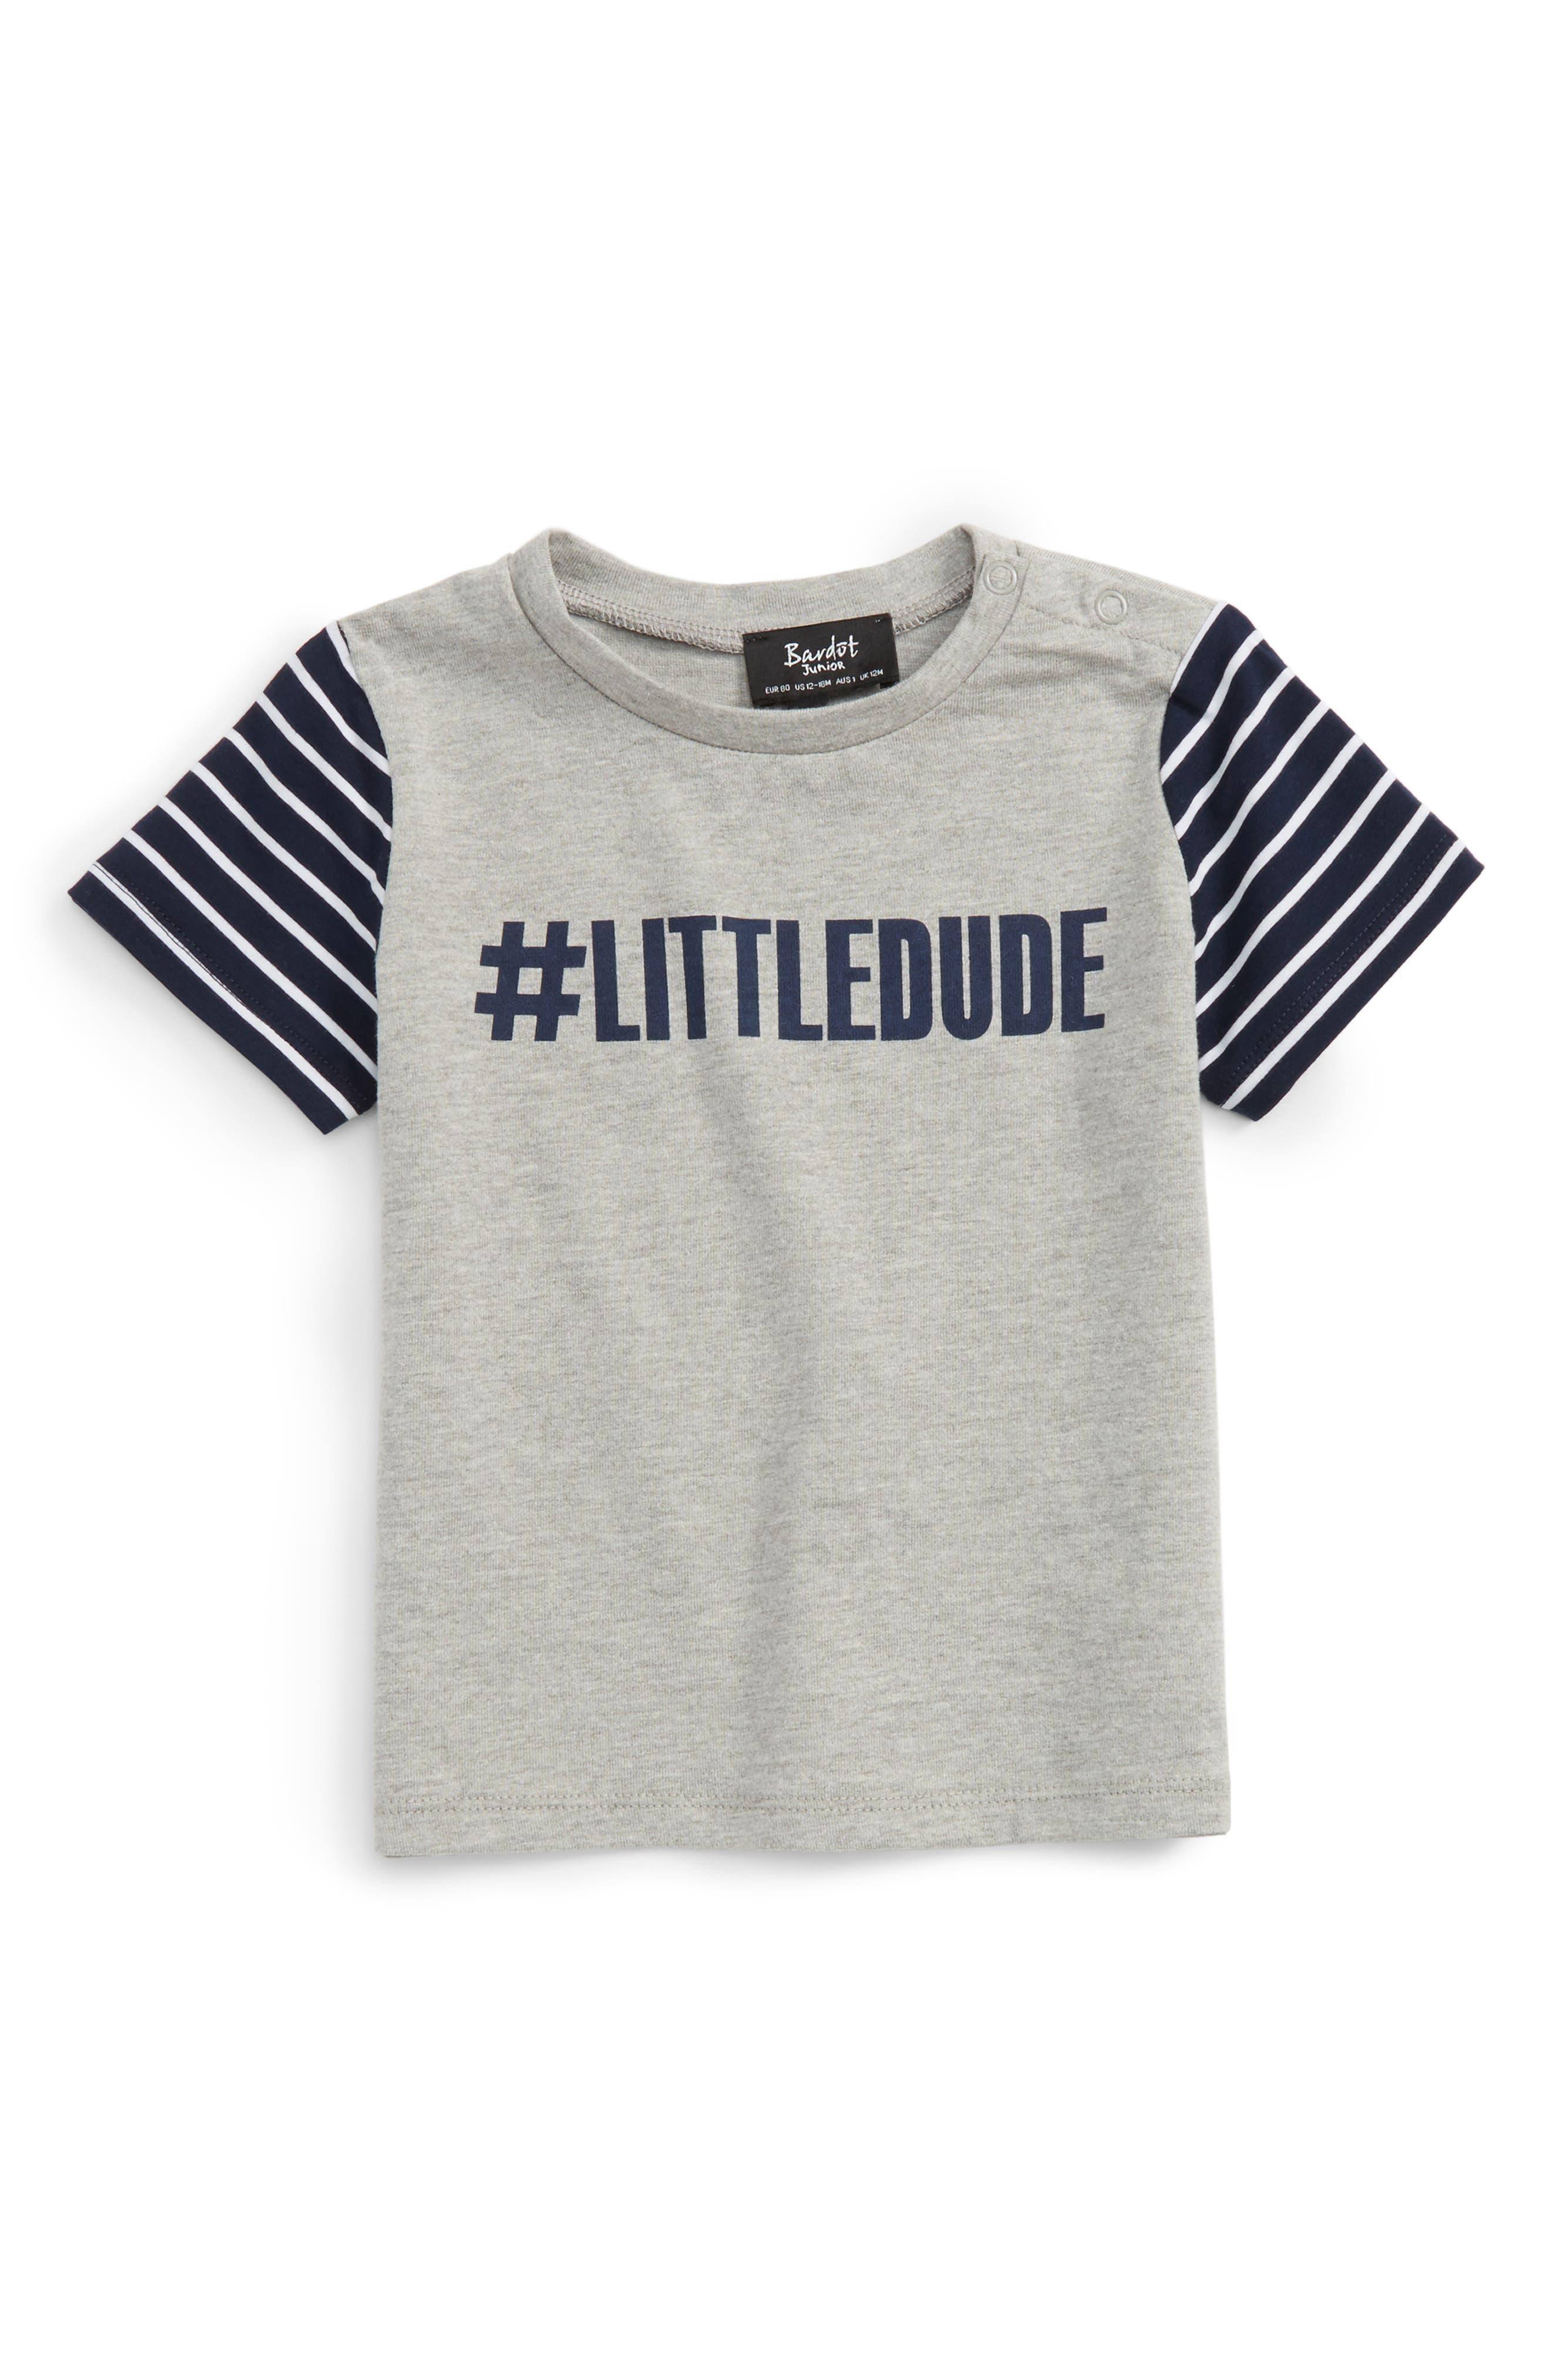 Alternate Image 1 Selected - Bardot Junior LittleDude T-Shirt (Baby Boys)